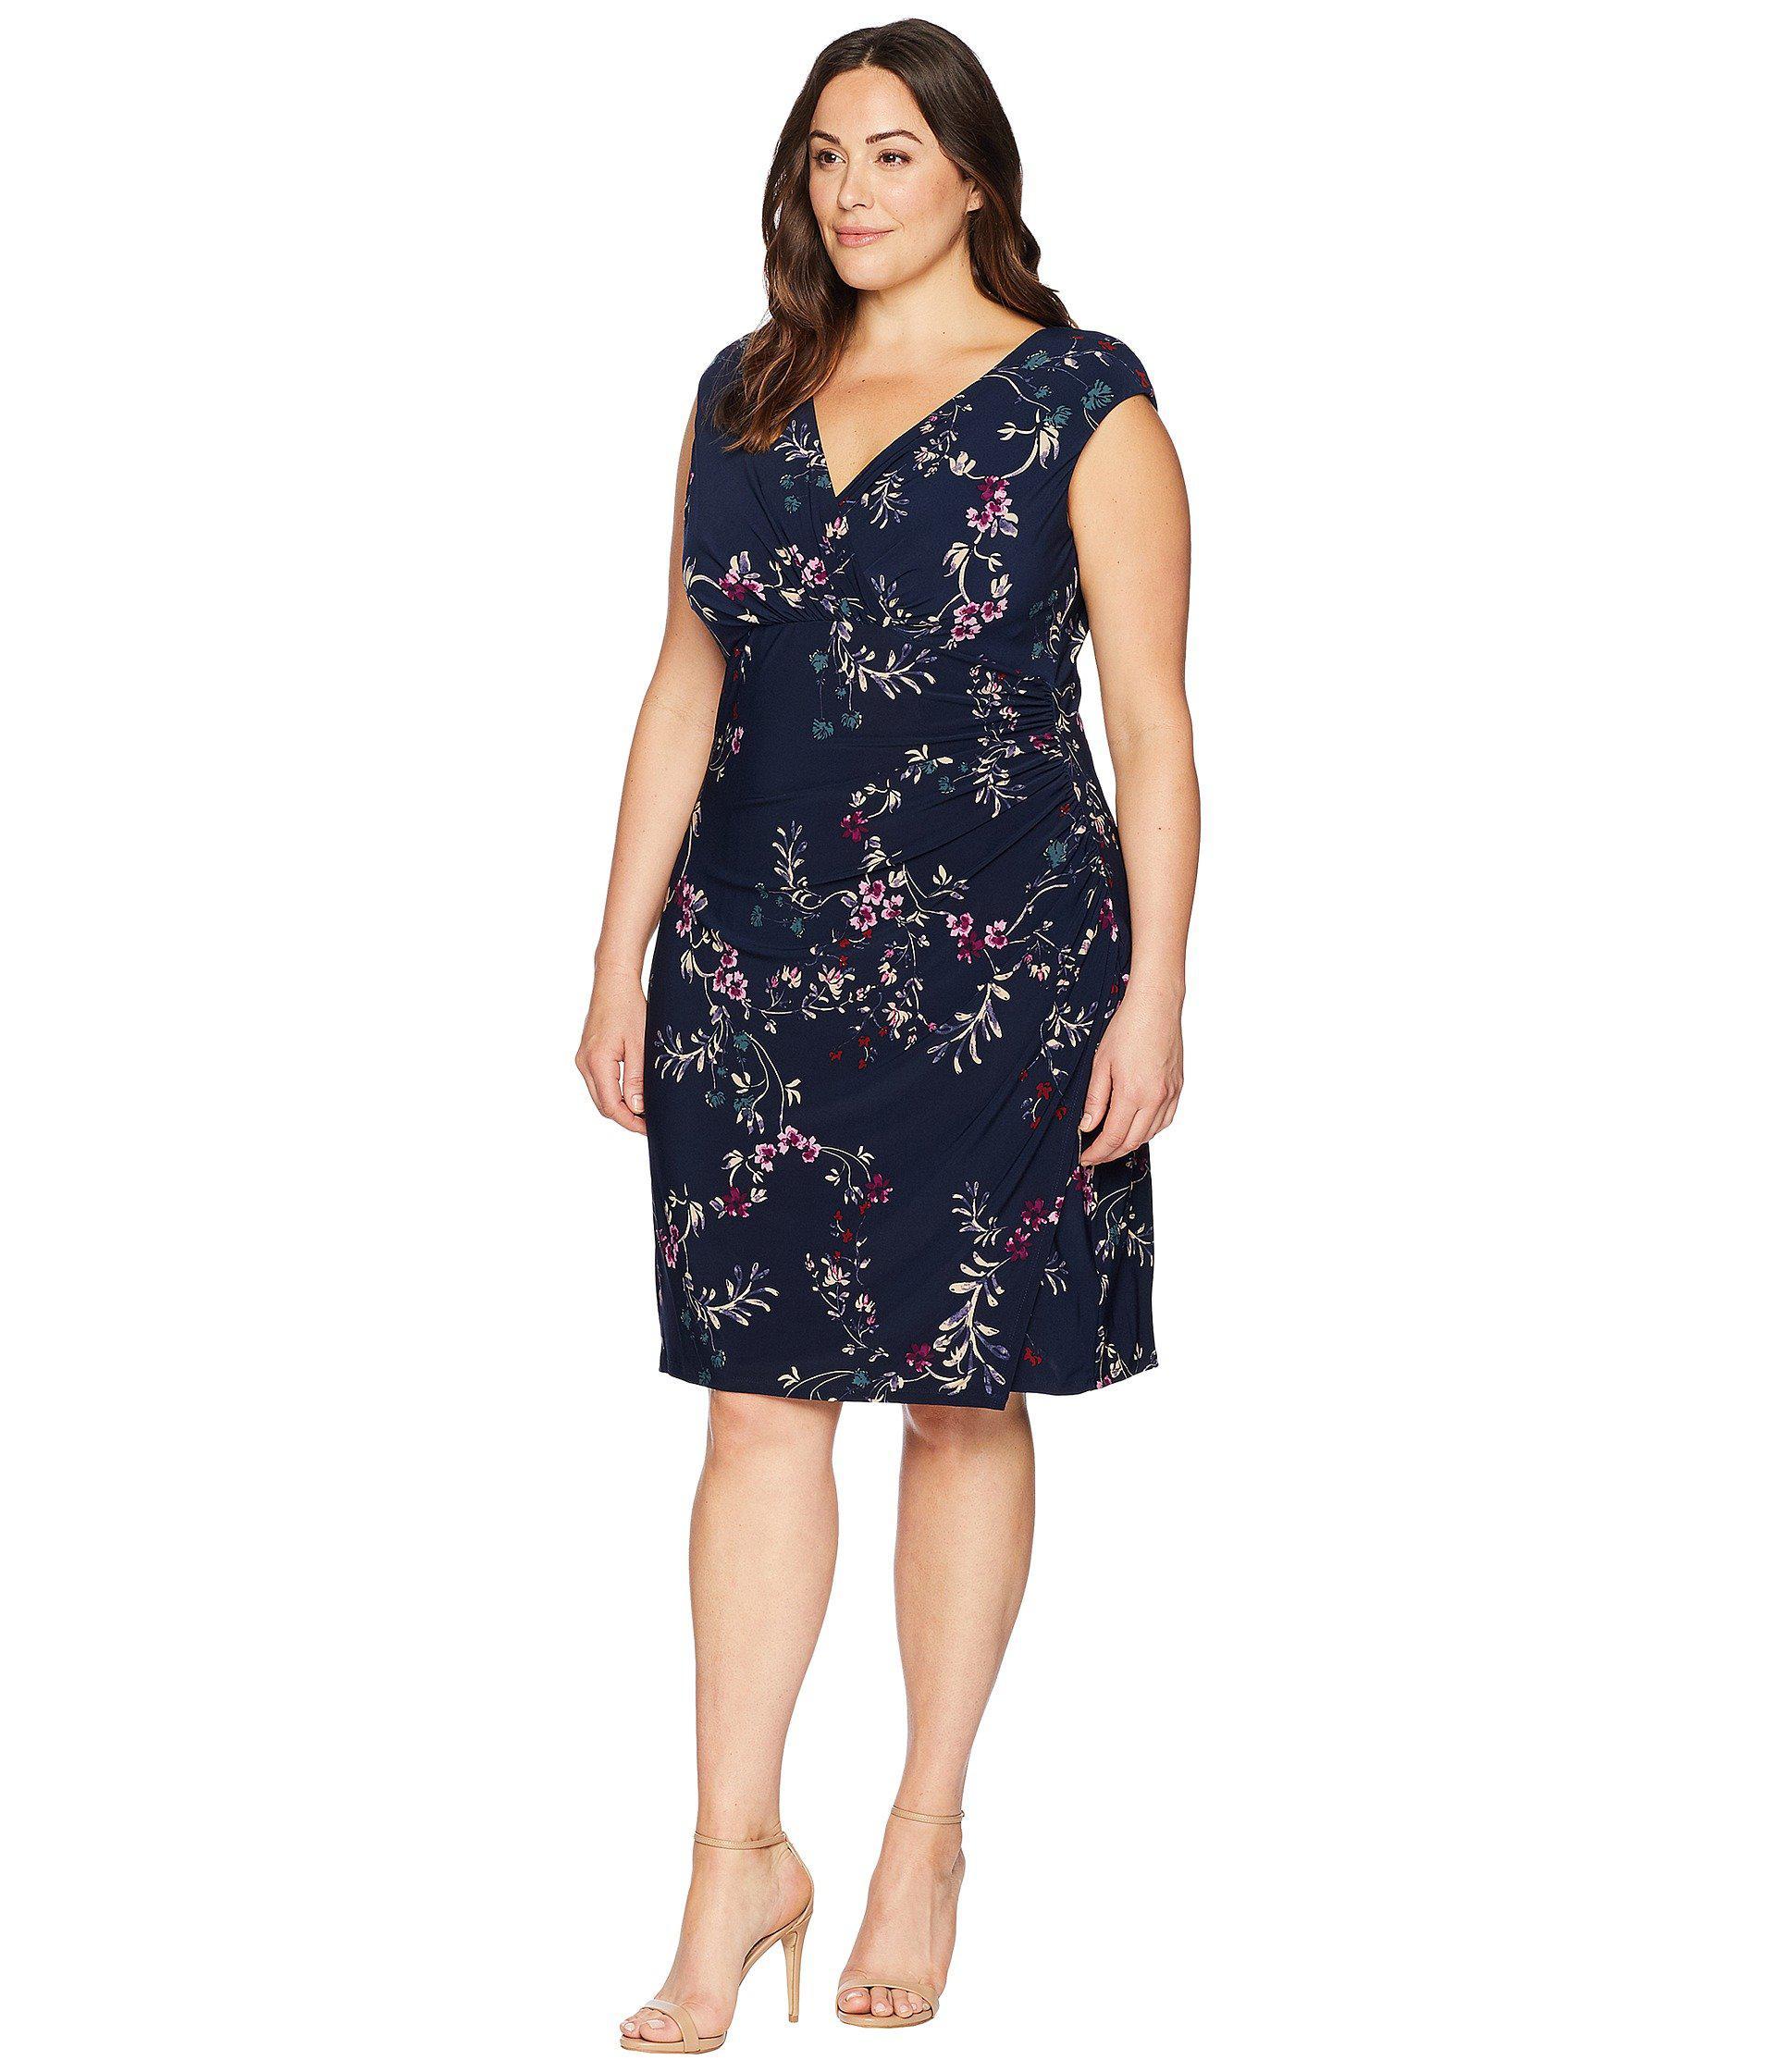 edcf8477 Lauren by Ralph Lauren Plus Size Adara Avendida Floral in Blue - Save 43% -  Lyst